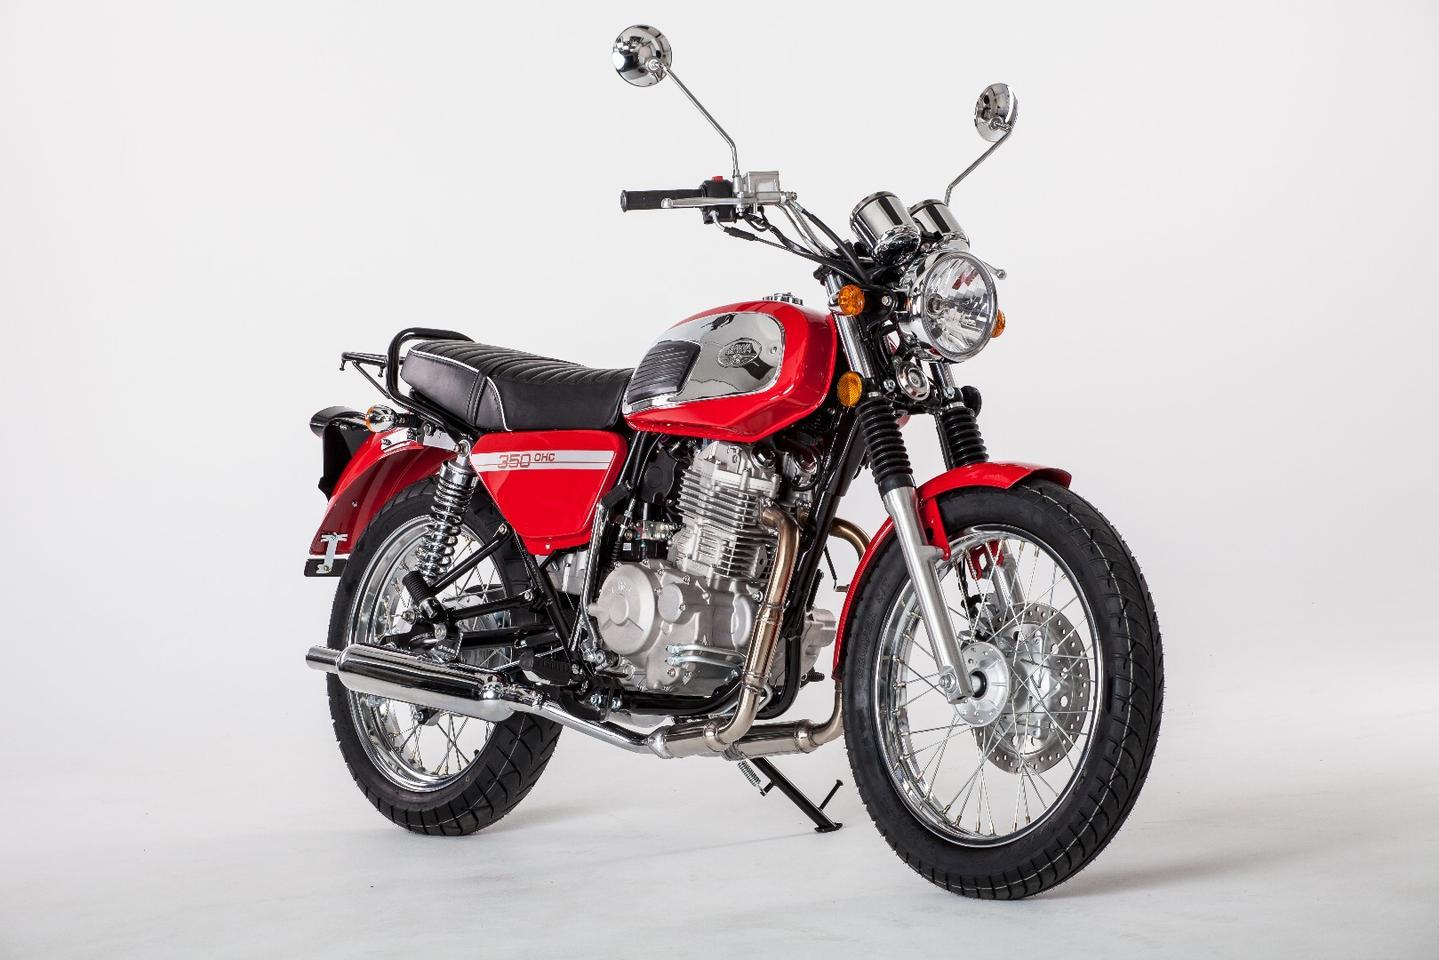 The 350 OHC ushers a legendary Jawa model family into a new era